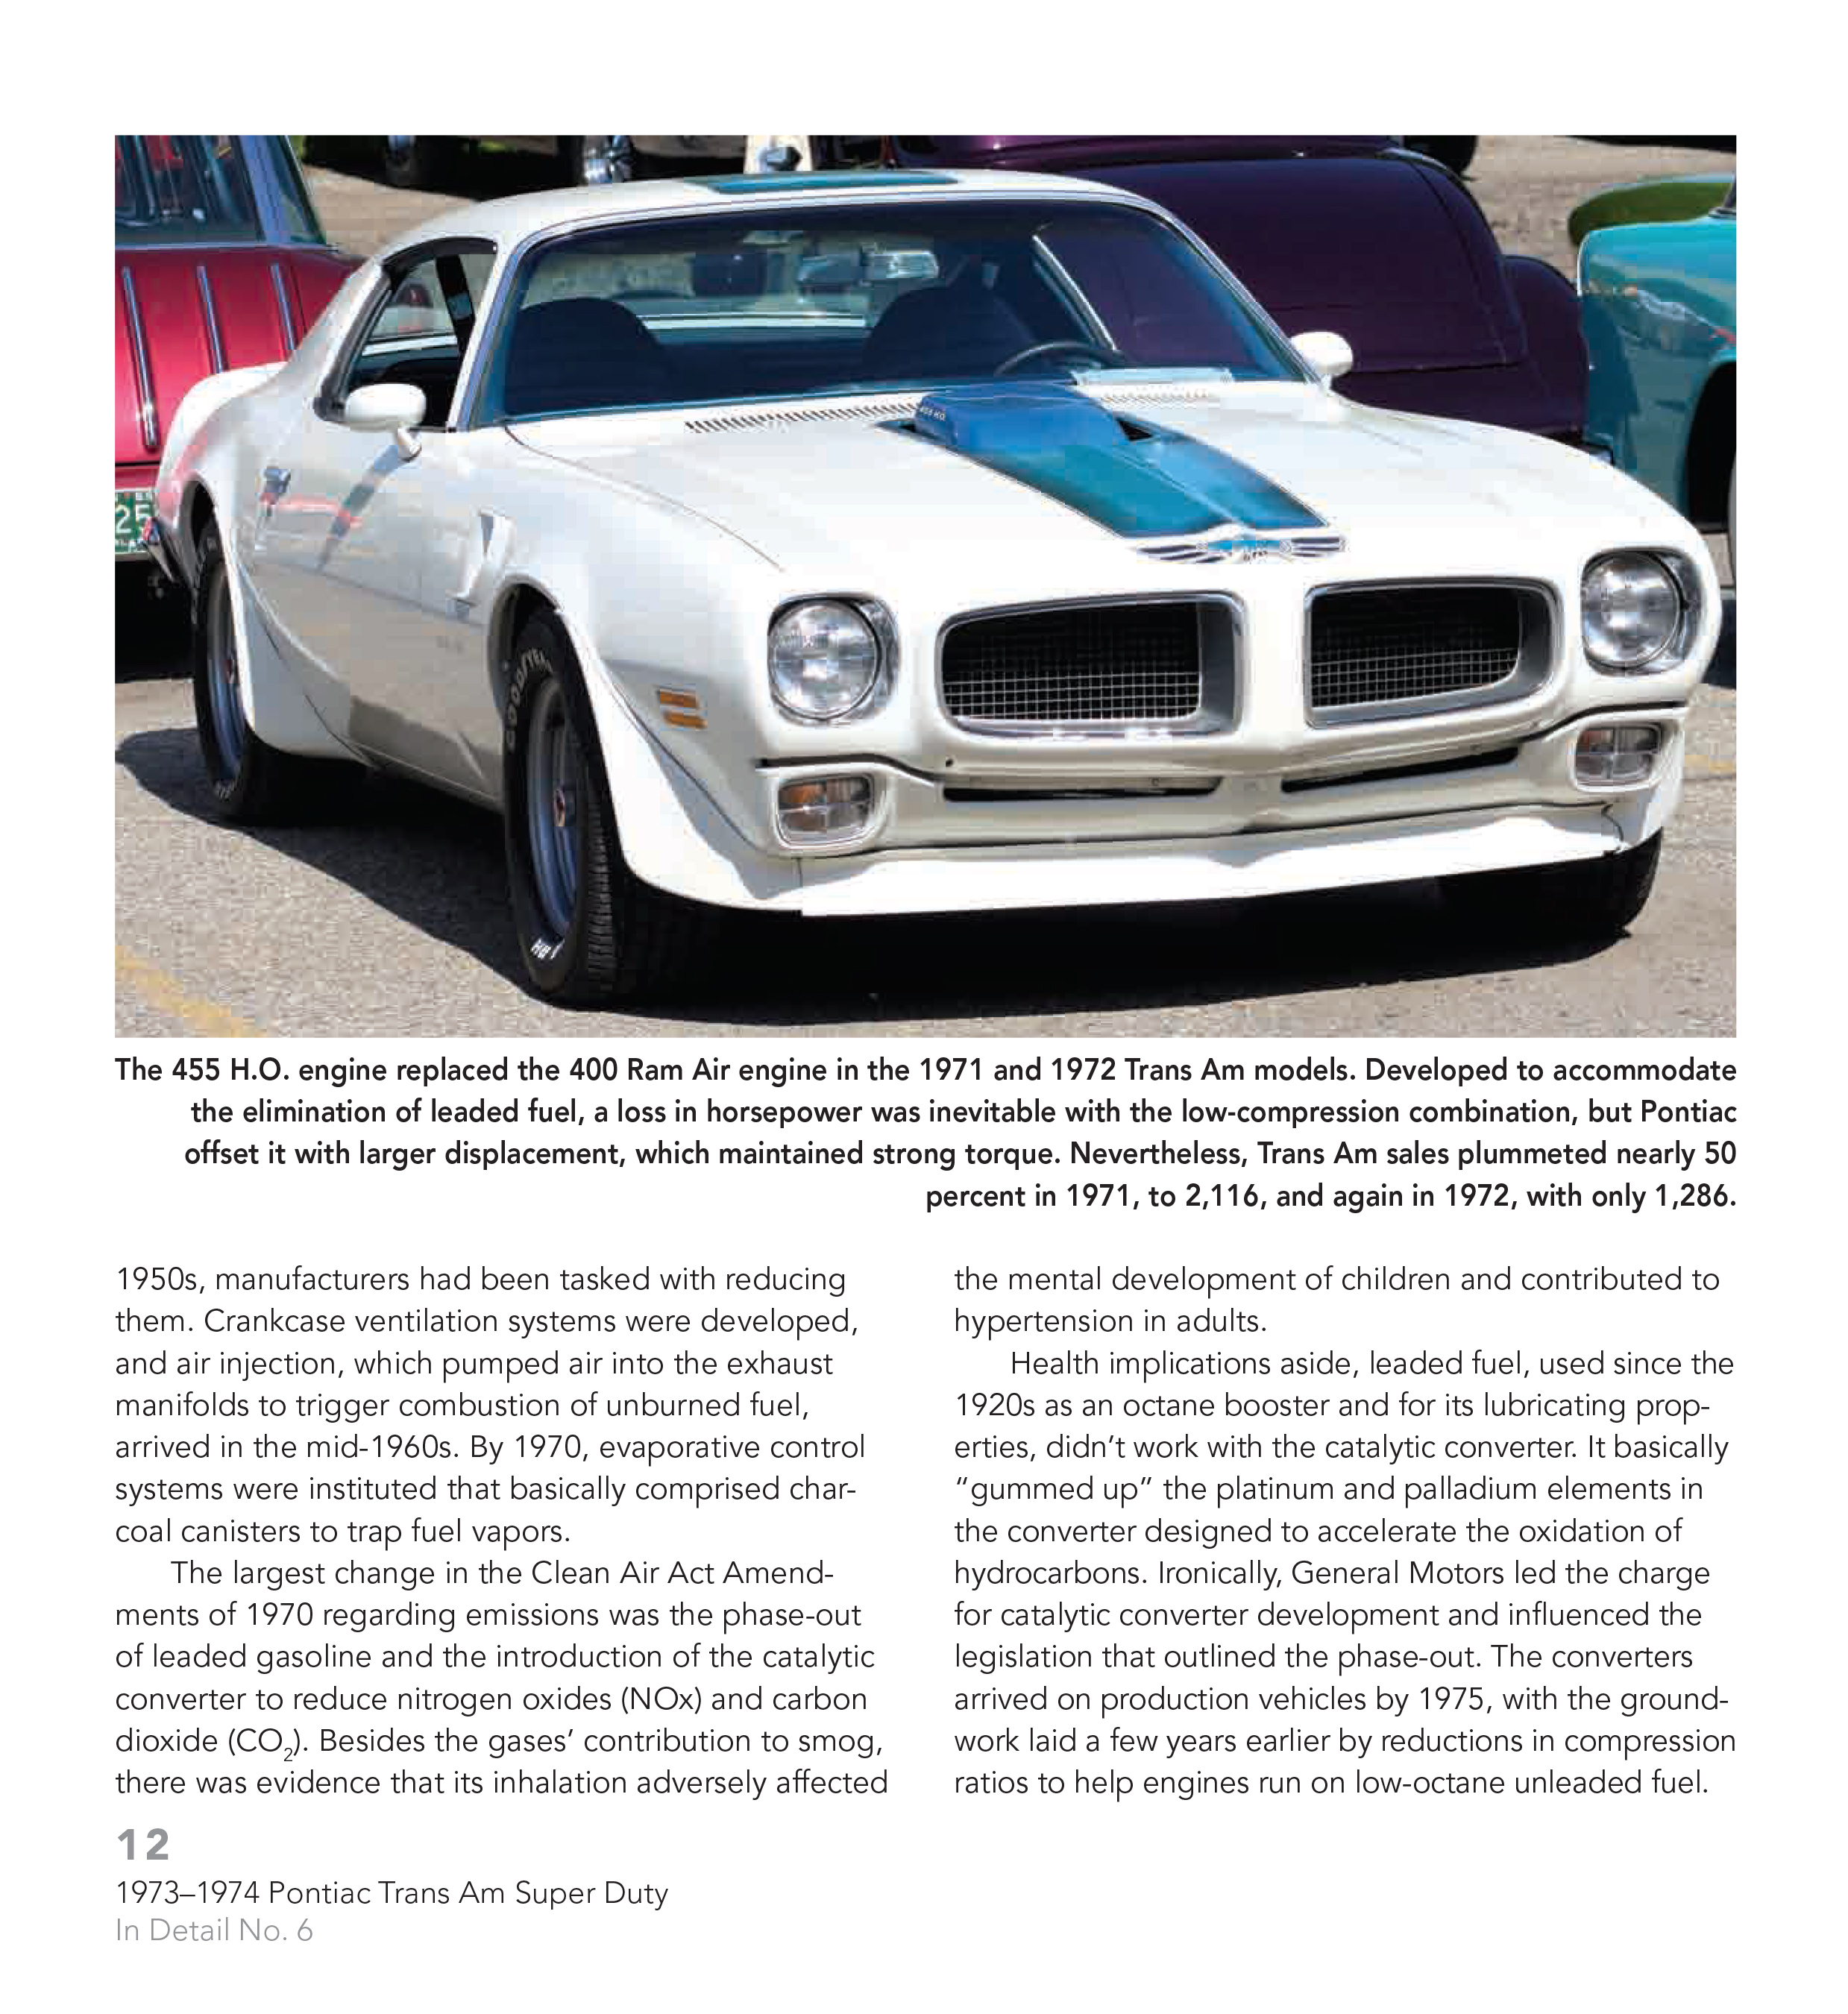 Trans Am Pontiac Trans Am Super Duty Muscle Cars In